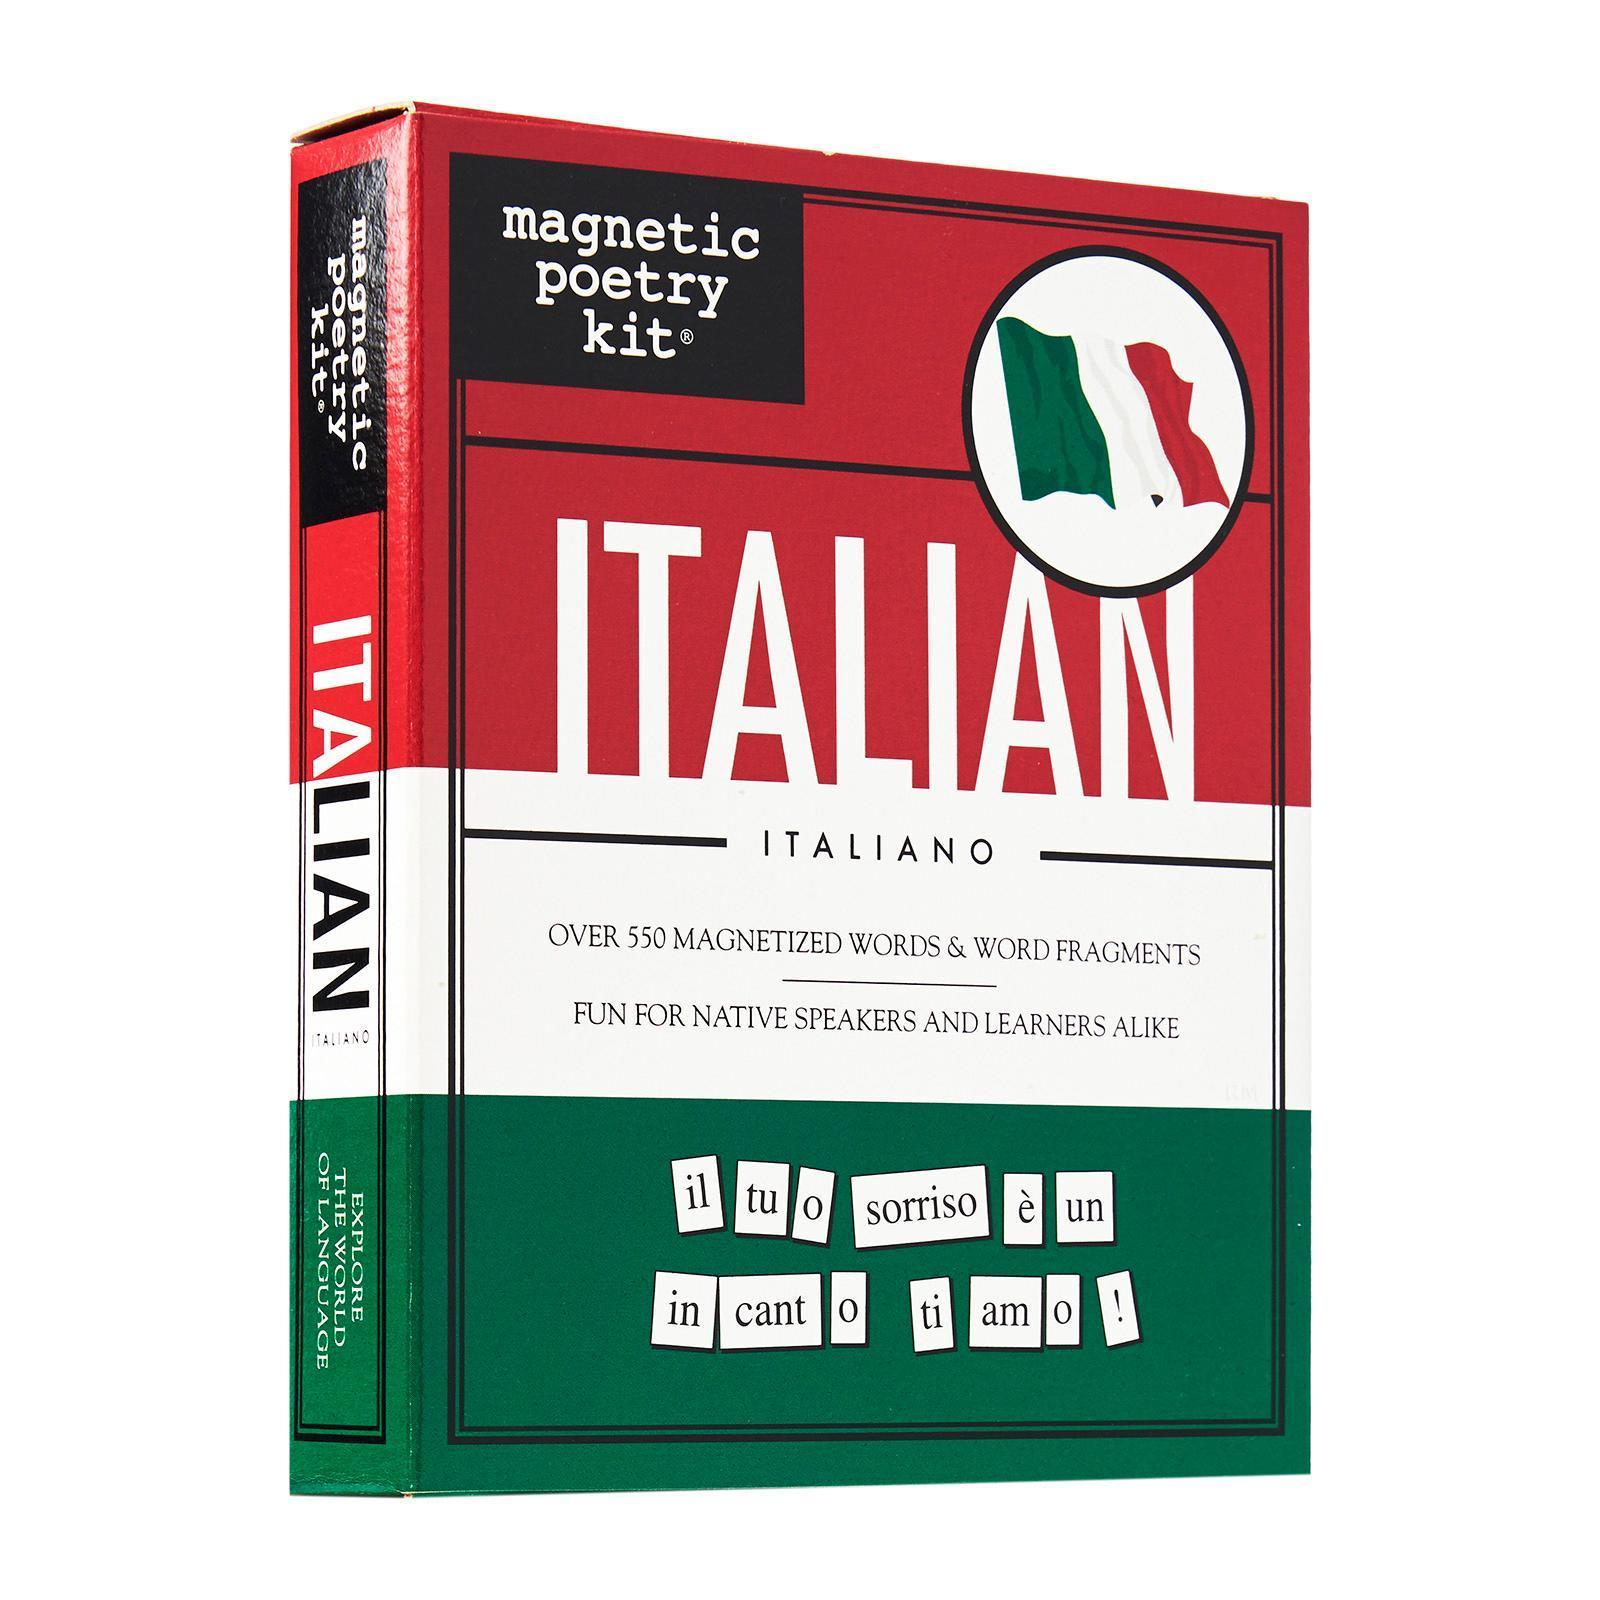 Magnetic Poetry Italian